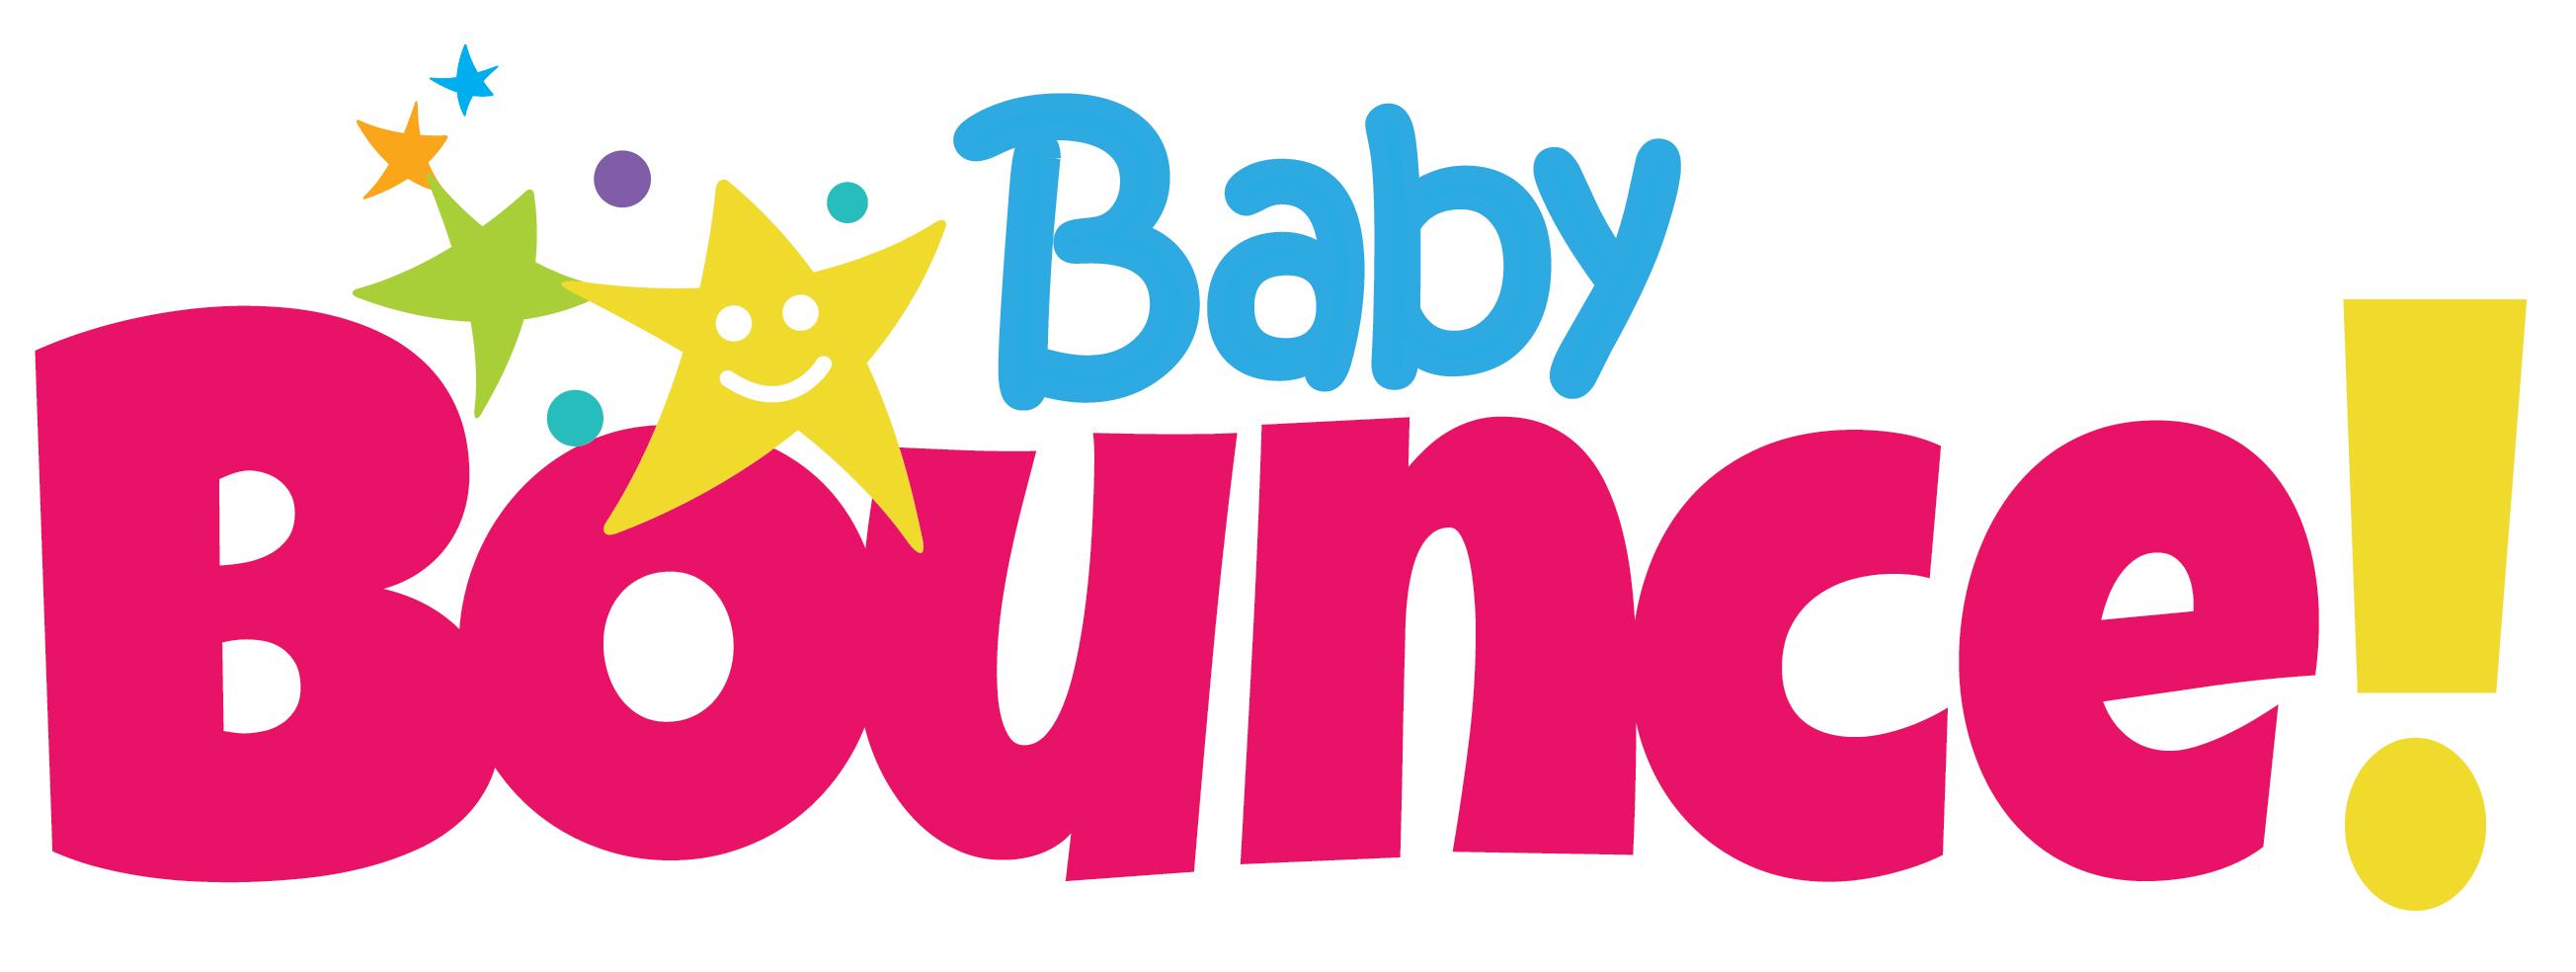 Baby Bounce's logo